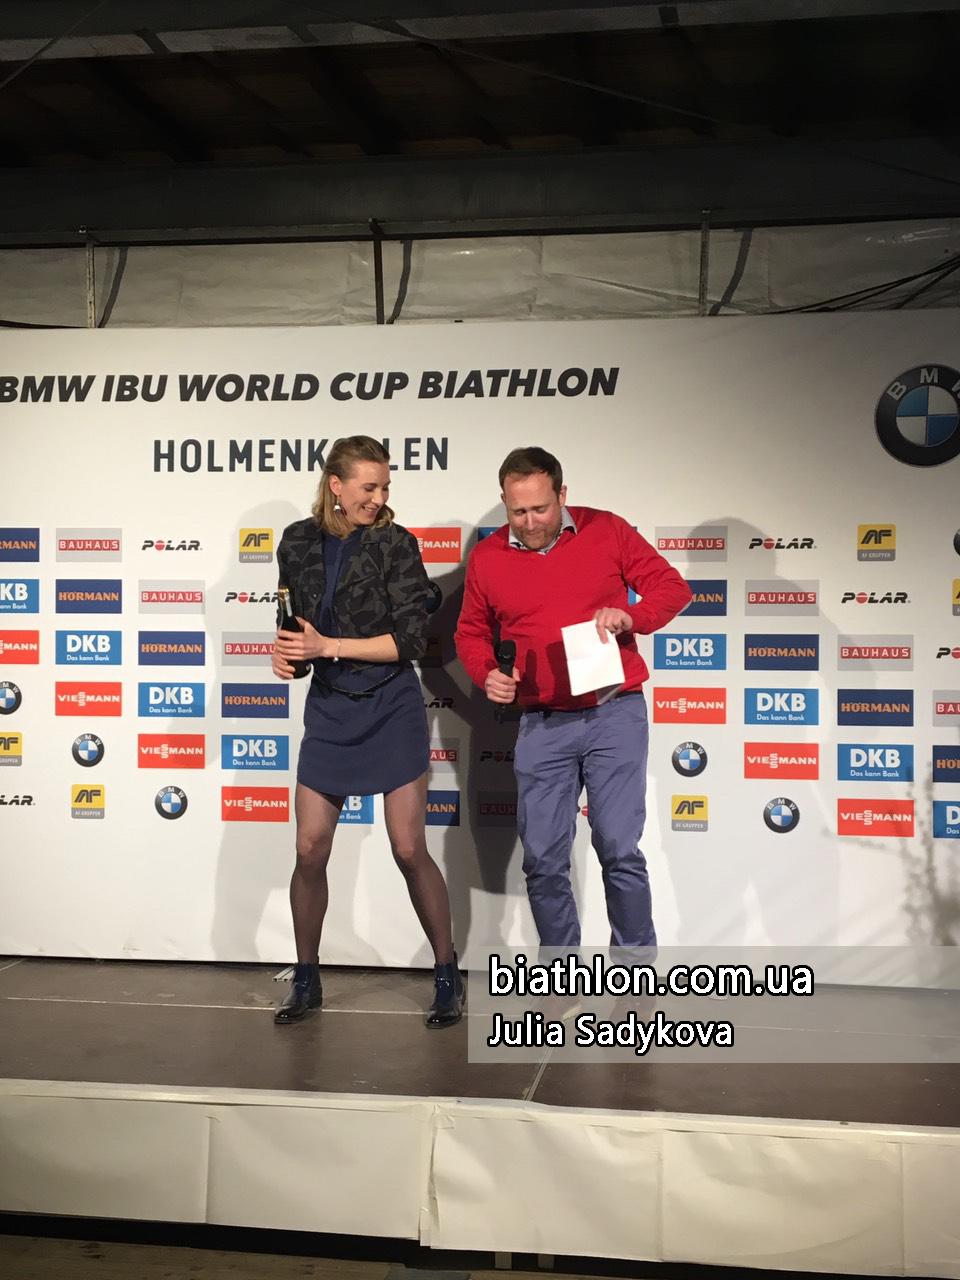 https://www.biathlon.com.ua/uploads/2019/99313.jpg